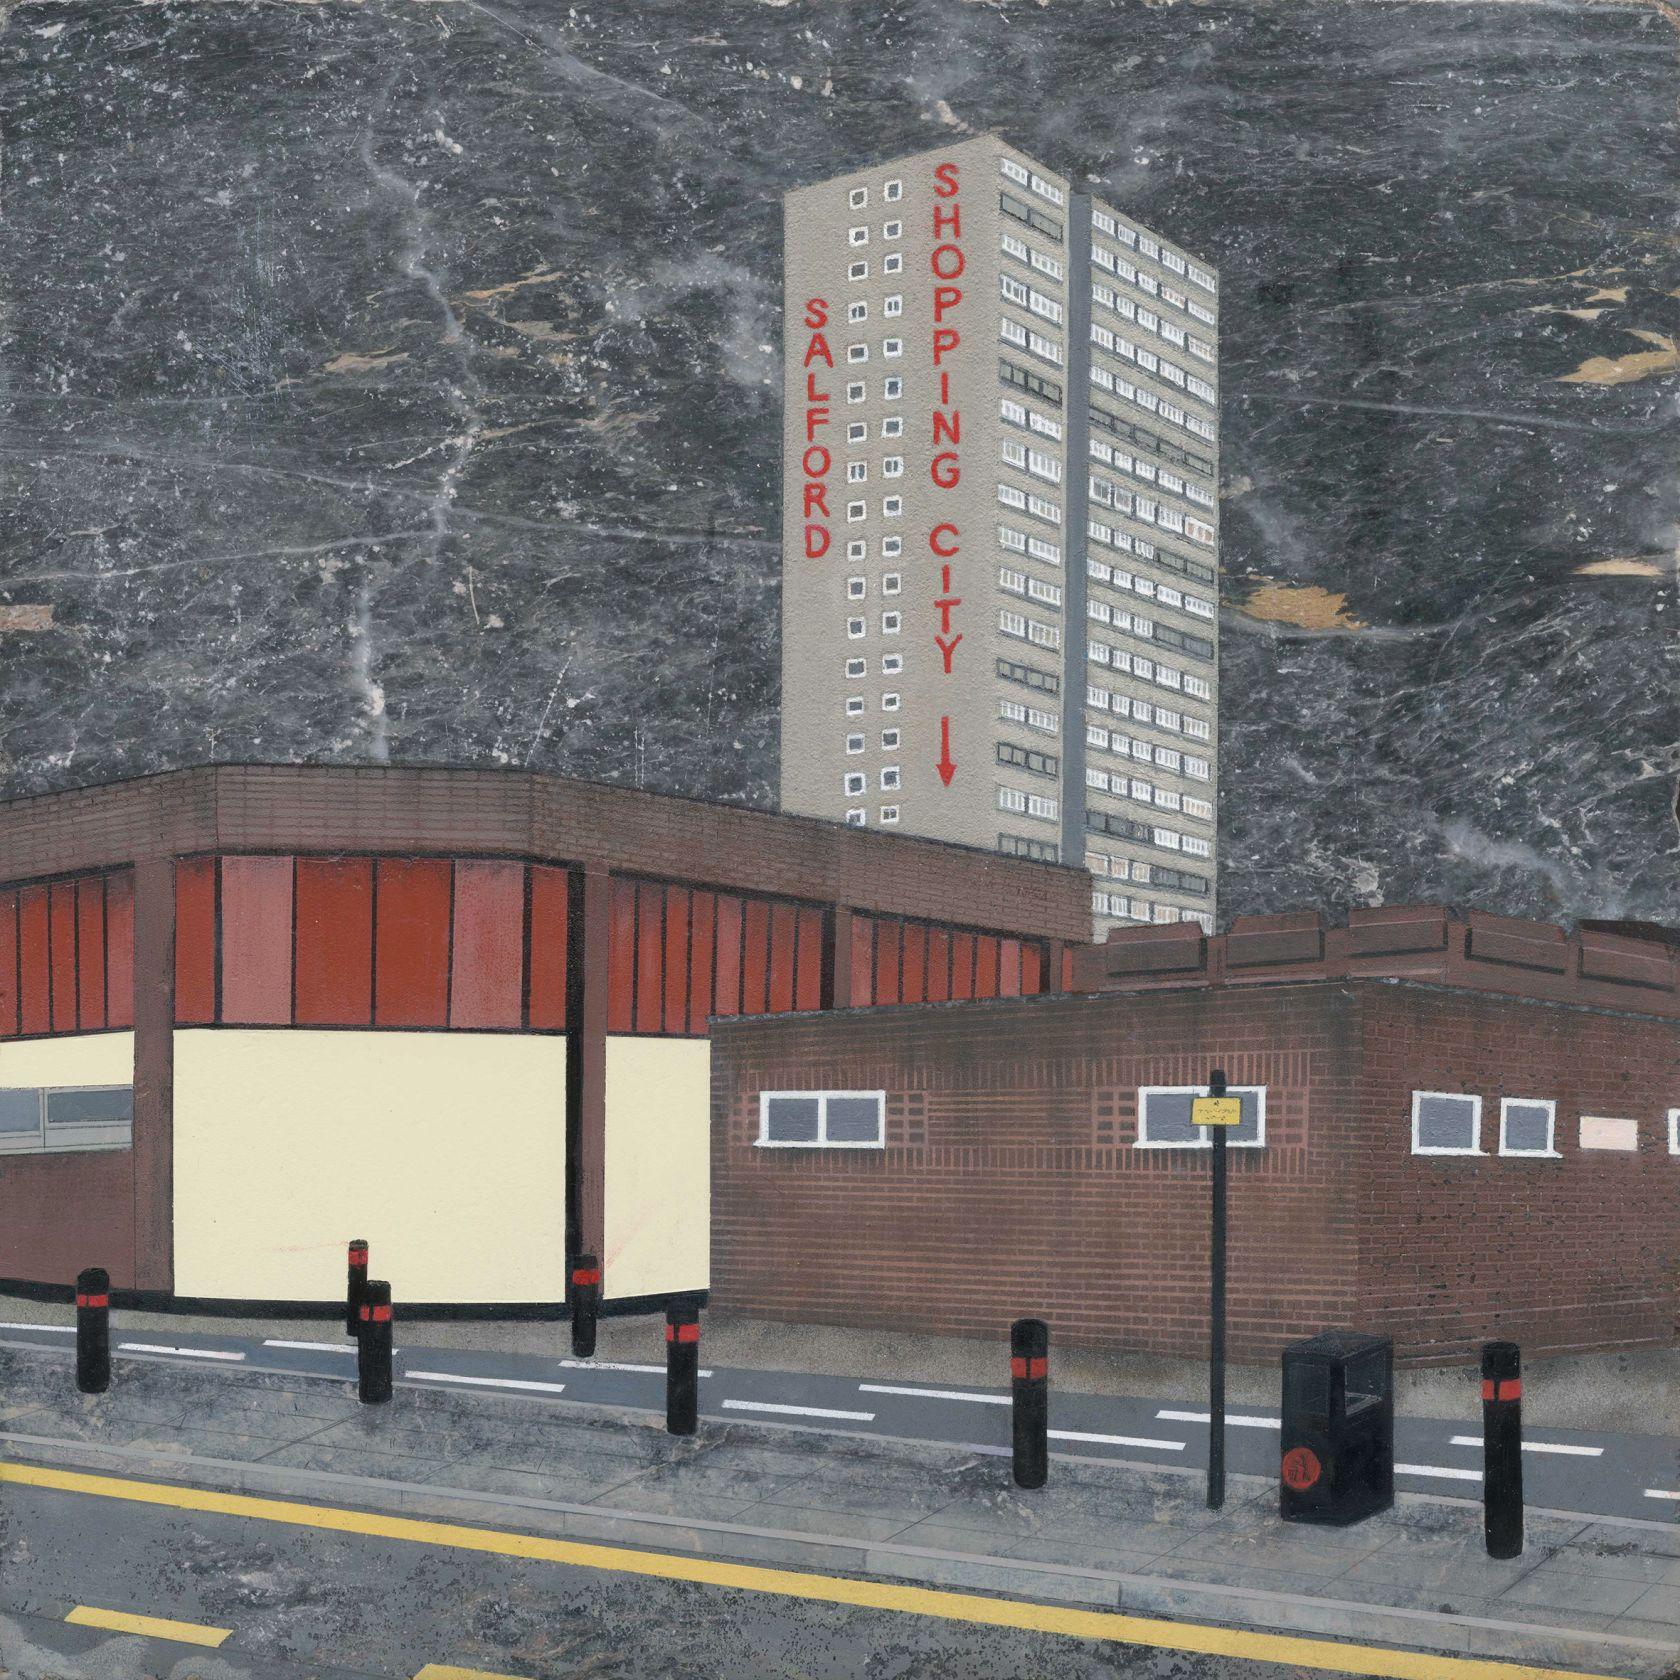 Rethinking the city: Saul Hay show celebrates Brutalist art